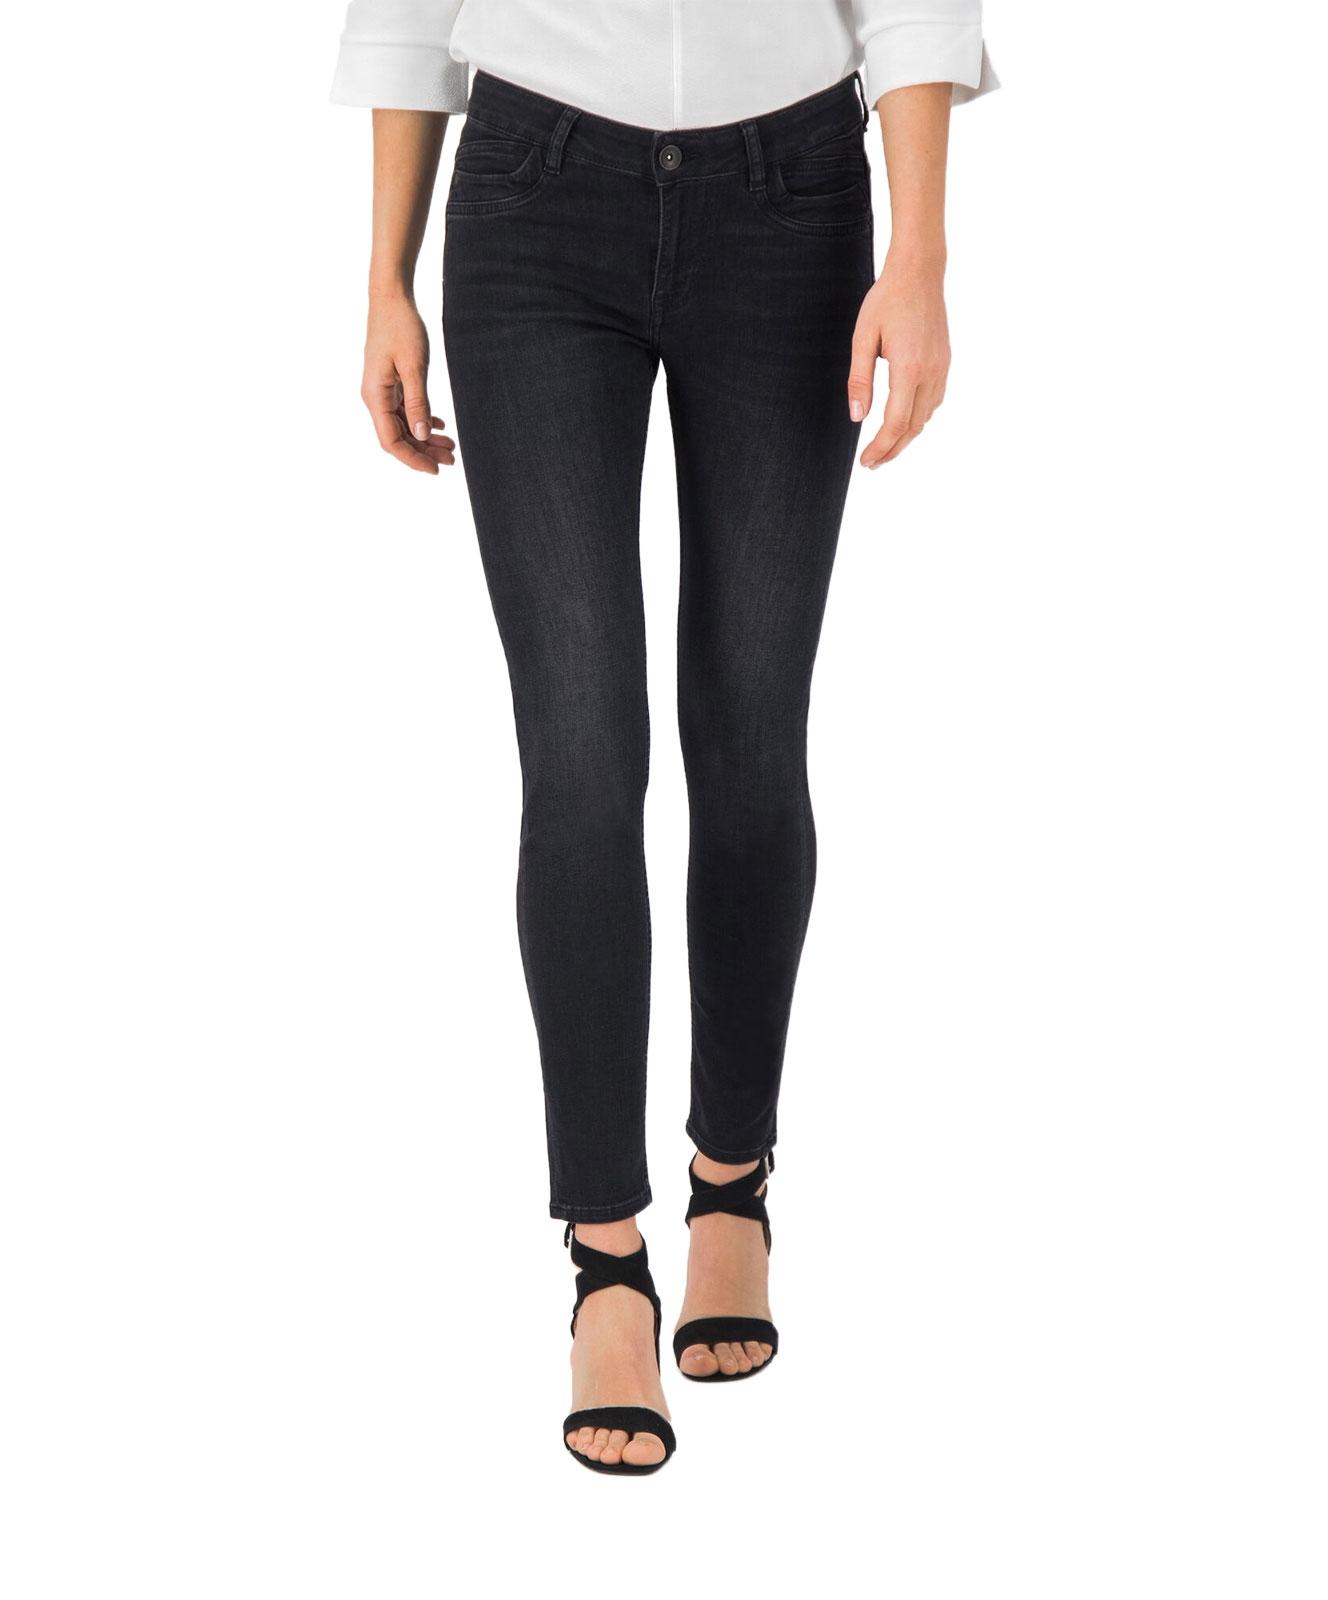 Hosen - Garcia Slim Fit Jeans Rachelle in Dark Used Black  - Onlineshop Jeans Meile